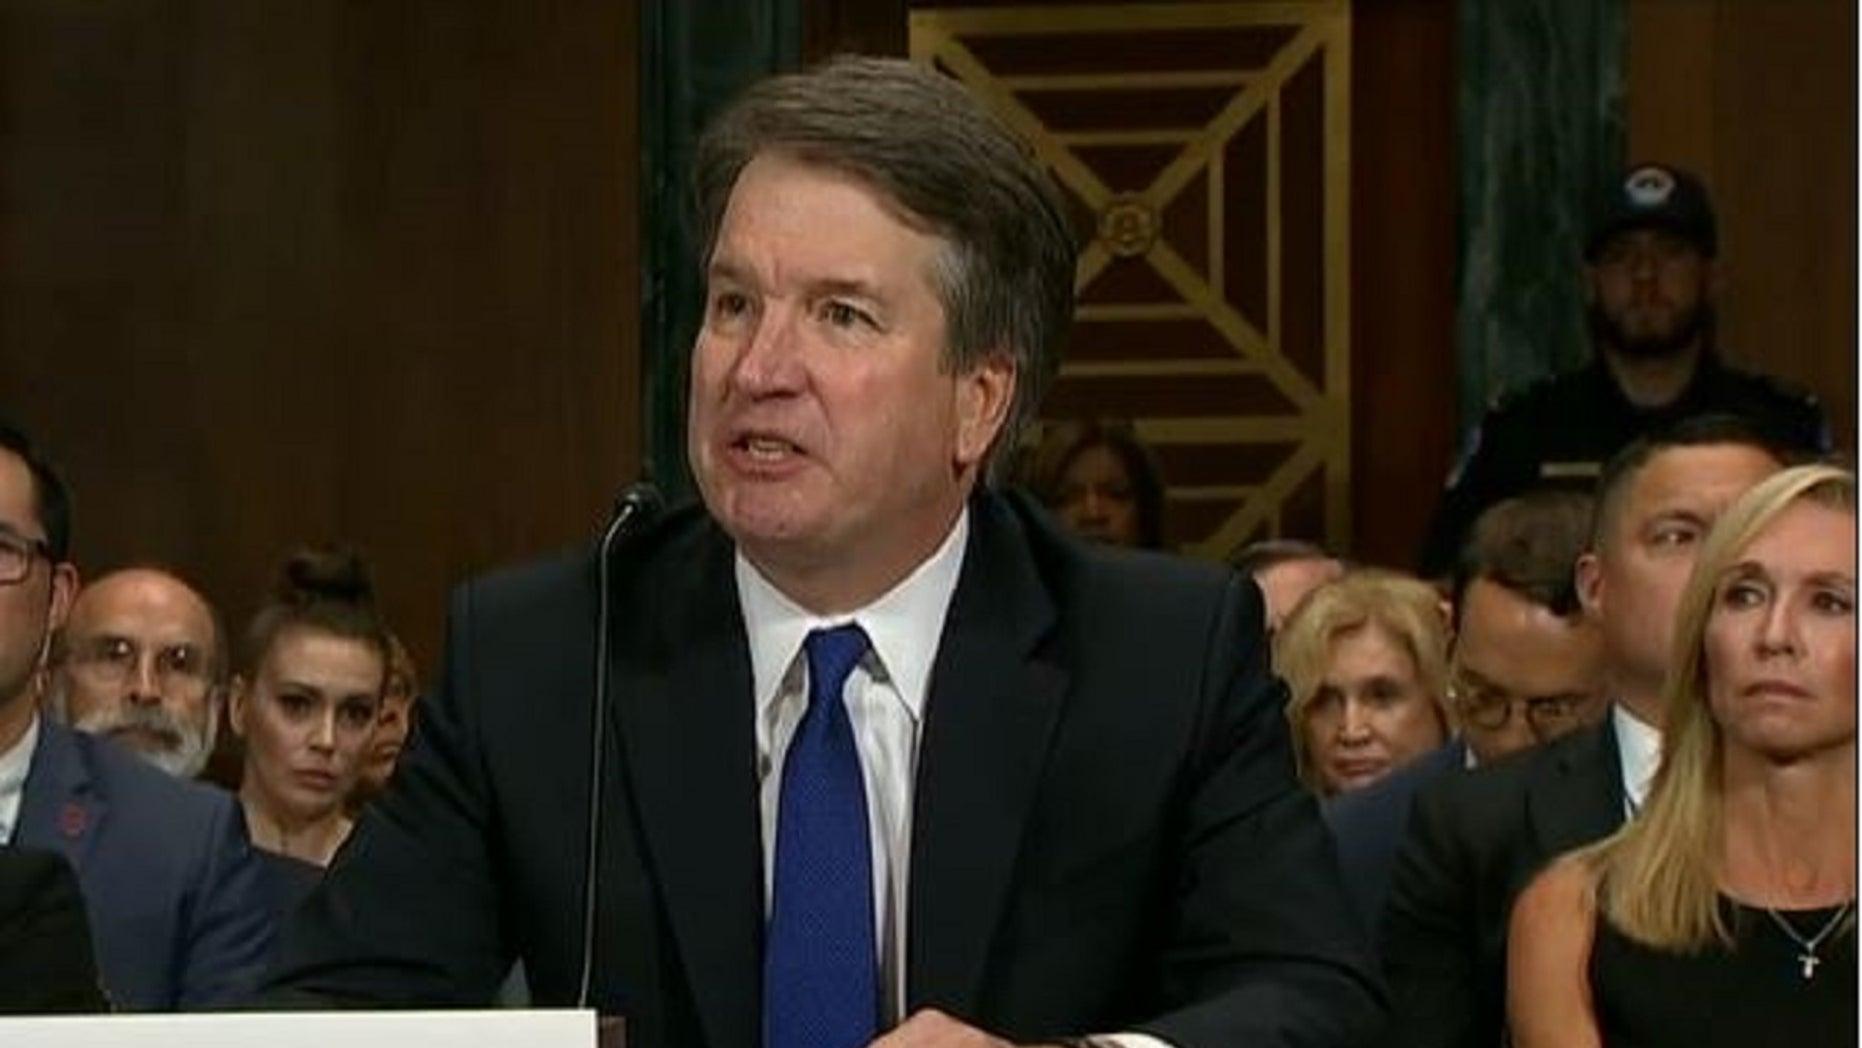 Brett Kavanaugh testifies before the Senate Judiciary Committee.